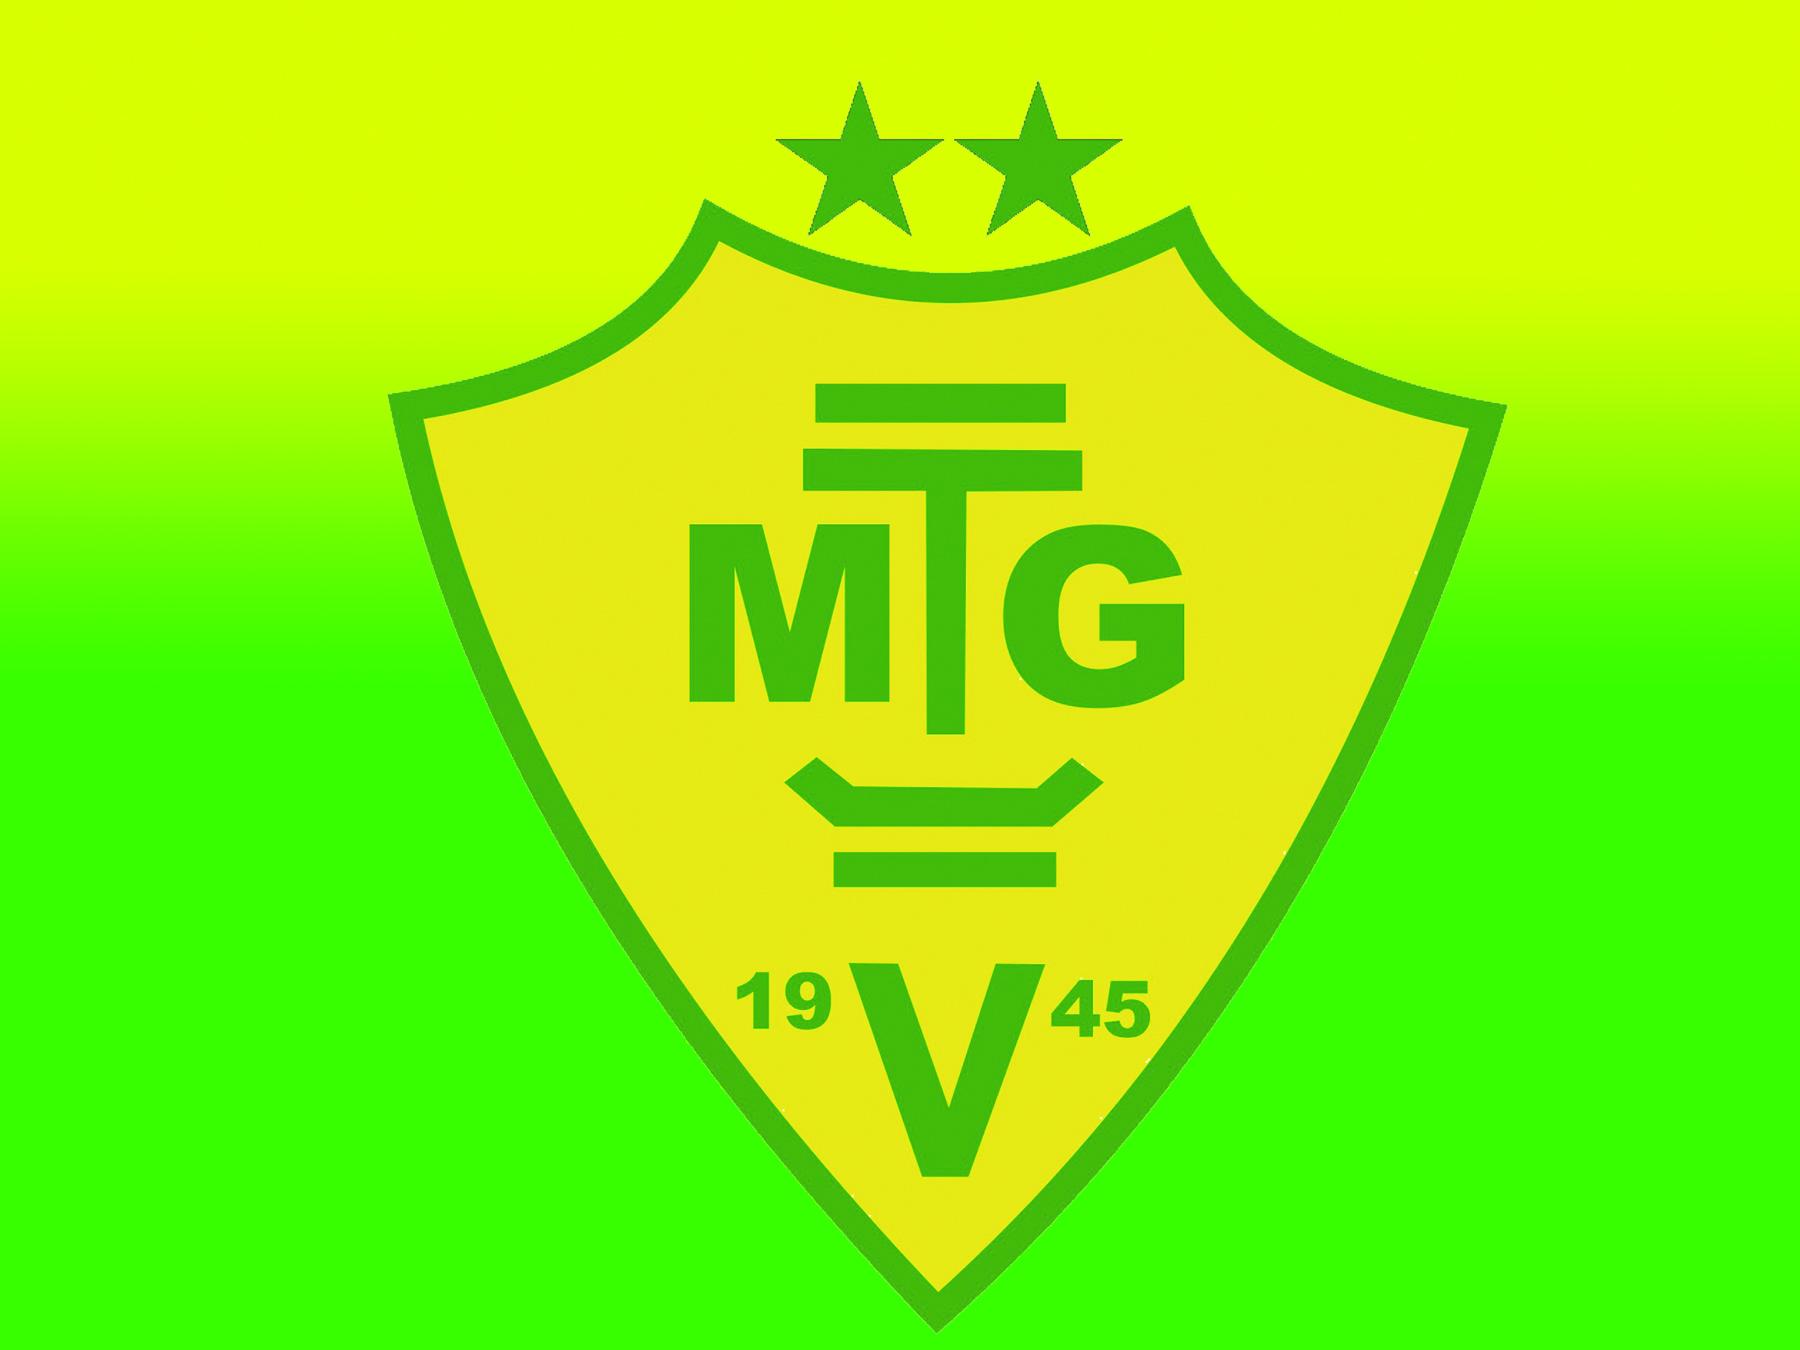 İşte MTG'nin transfer listesi